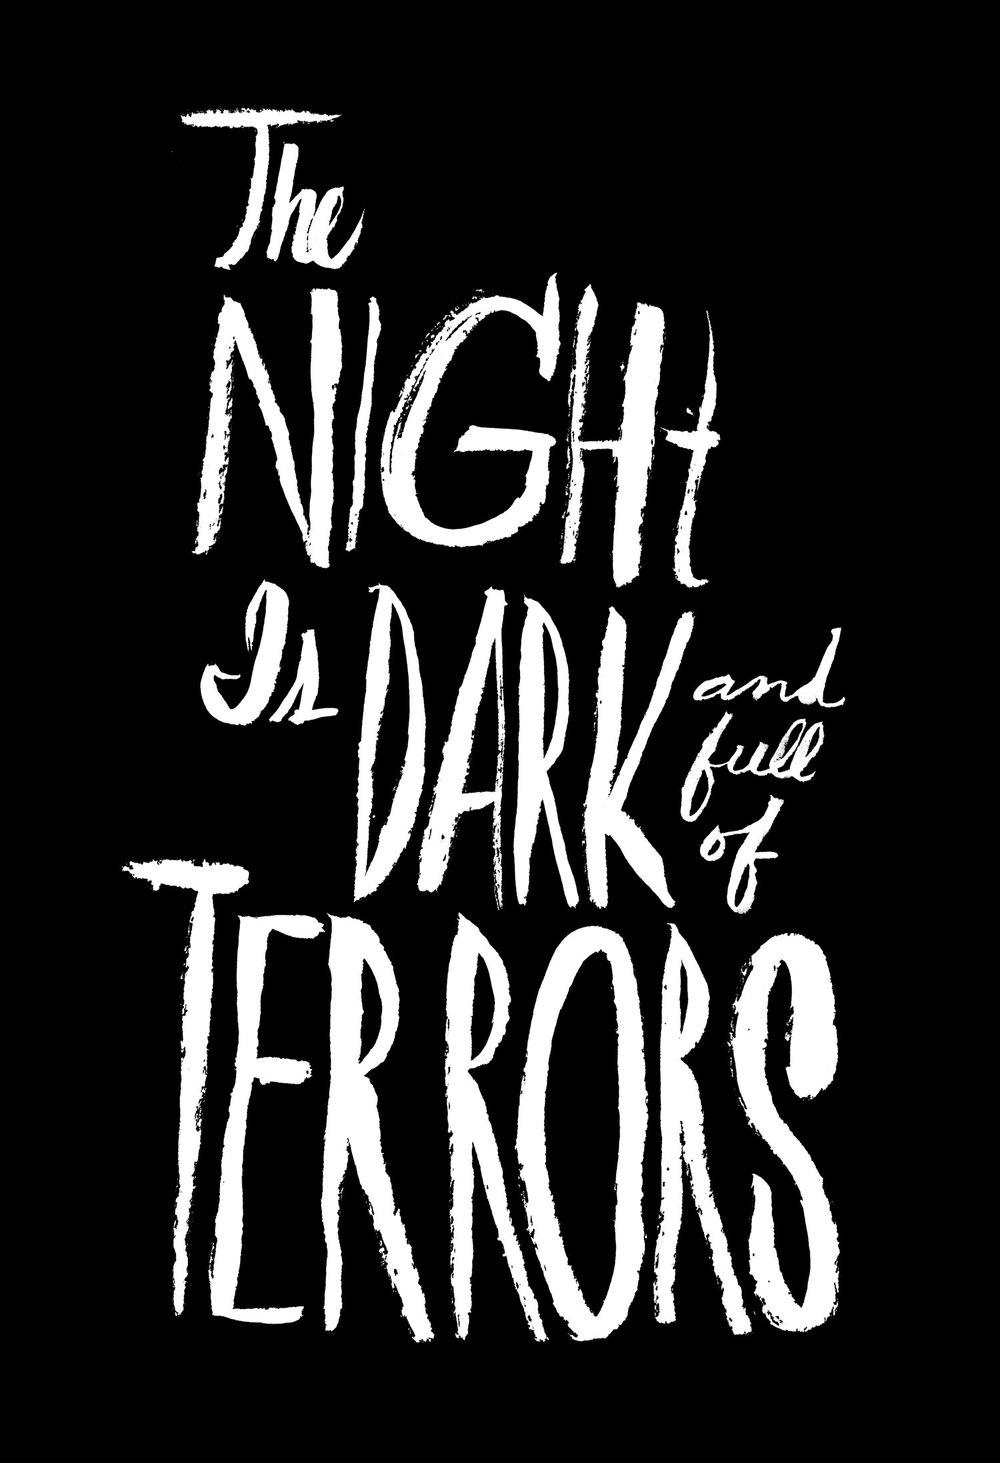 terrors.jpg